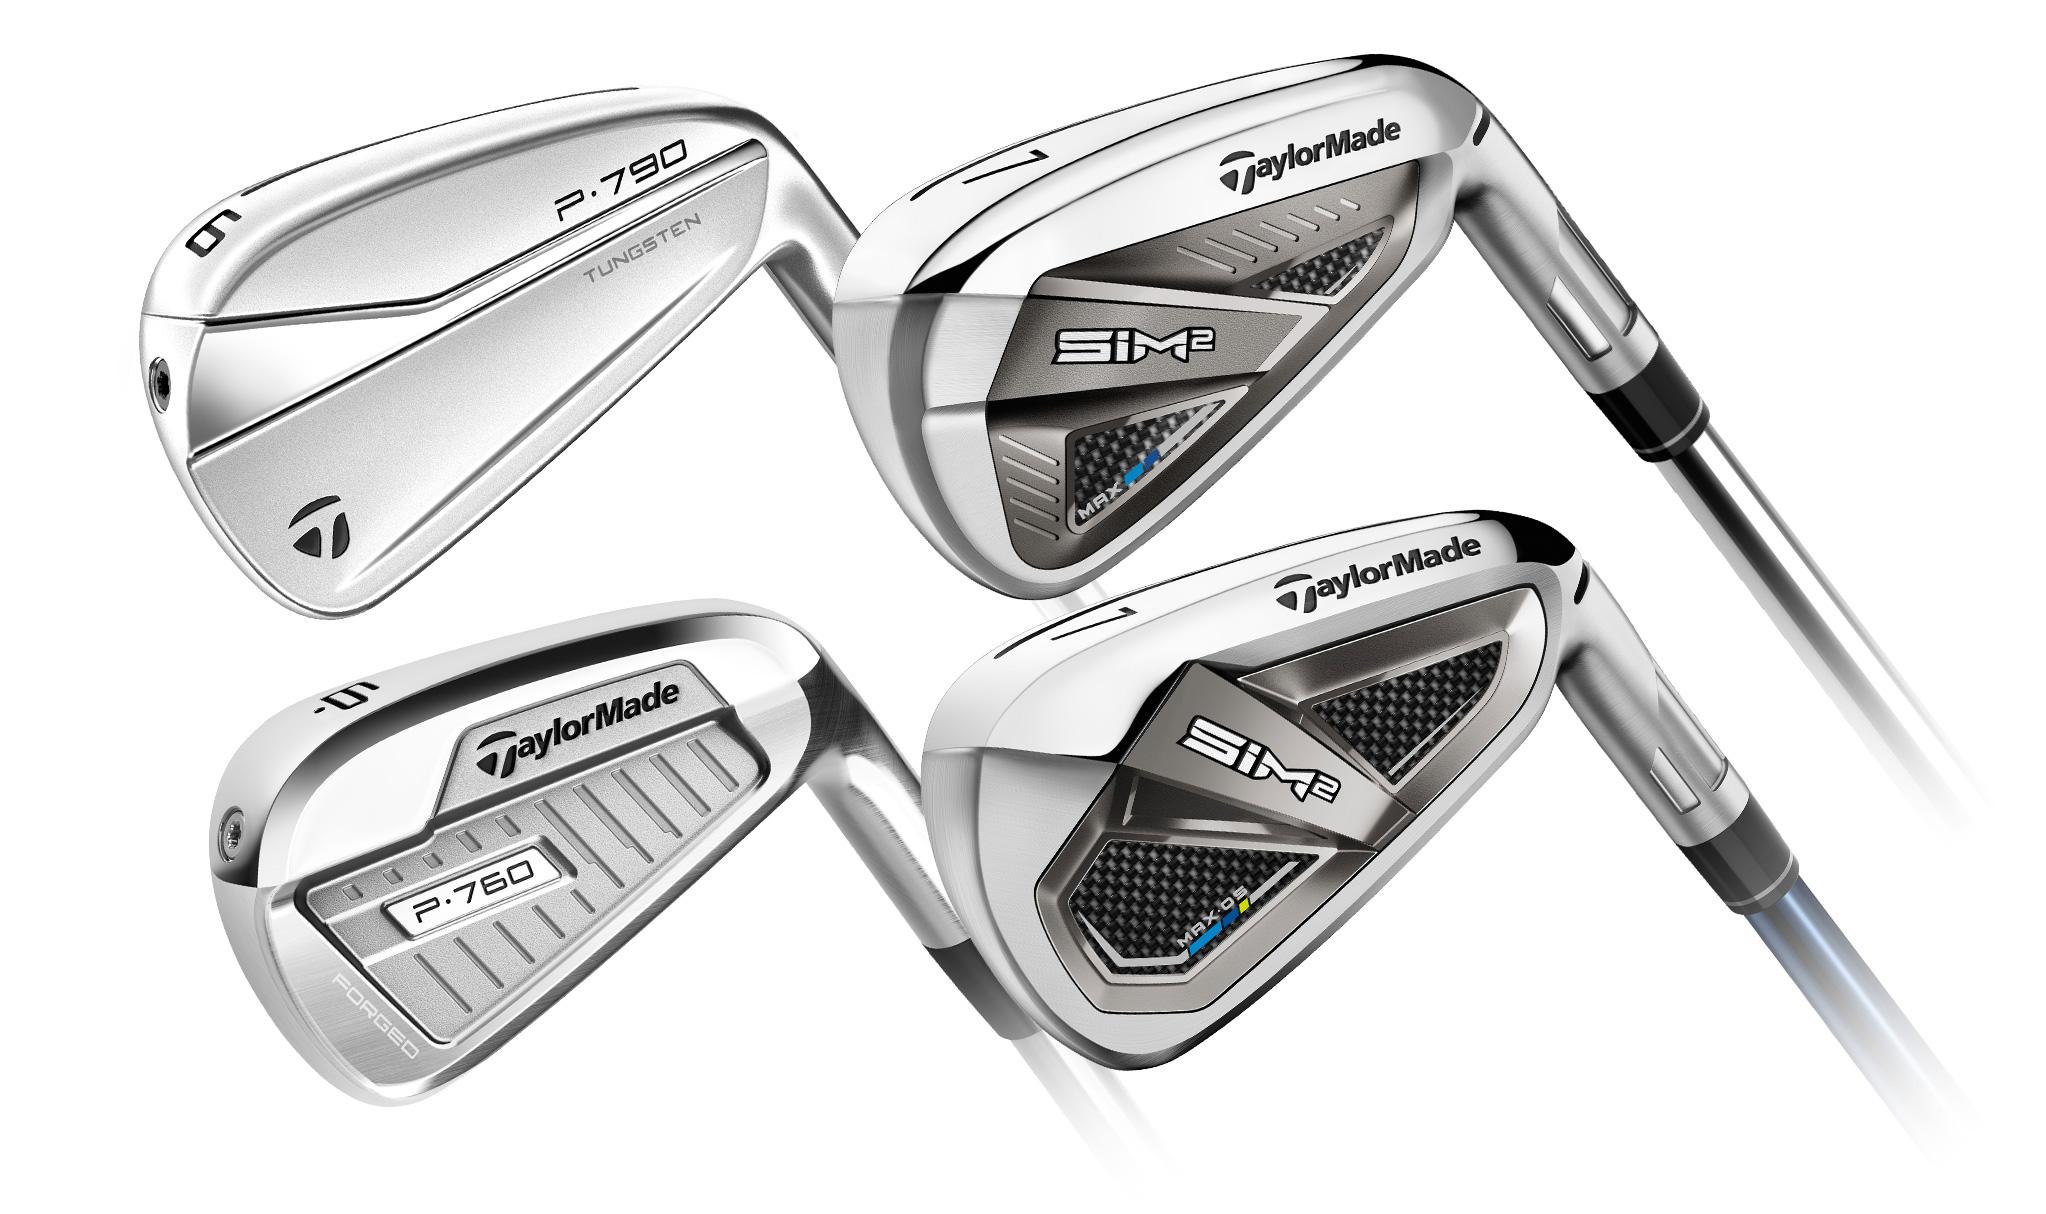 TaylorMade Golf Irons